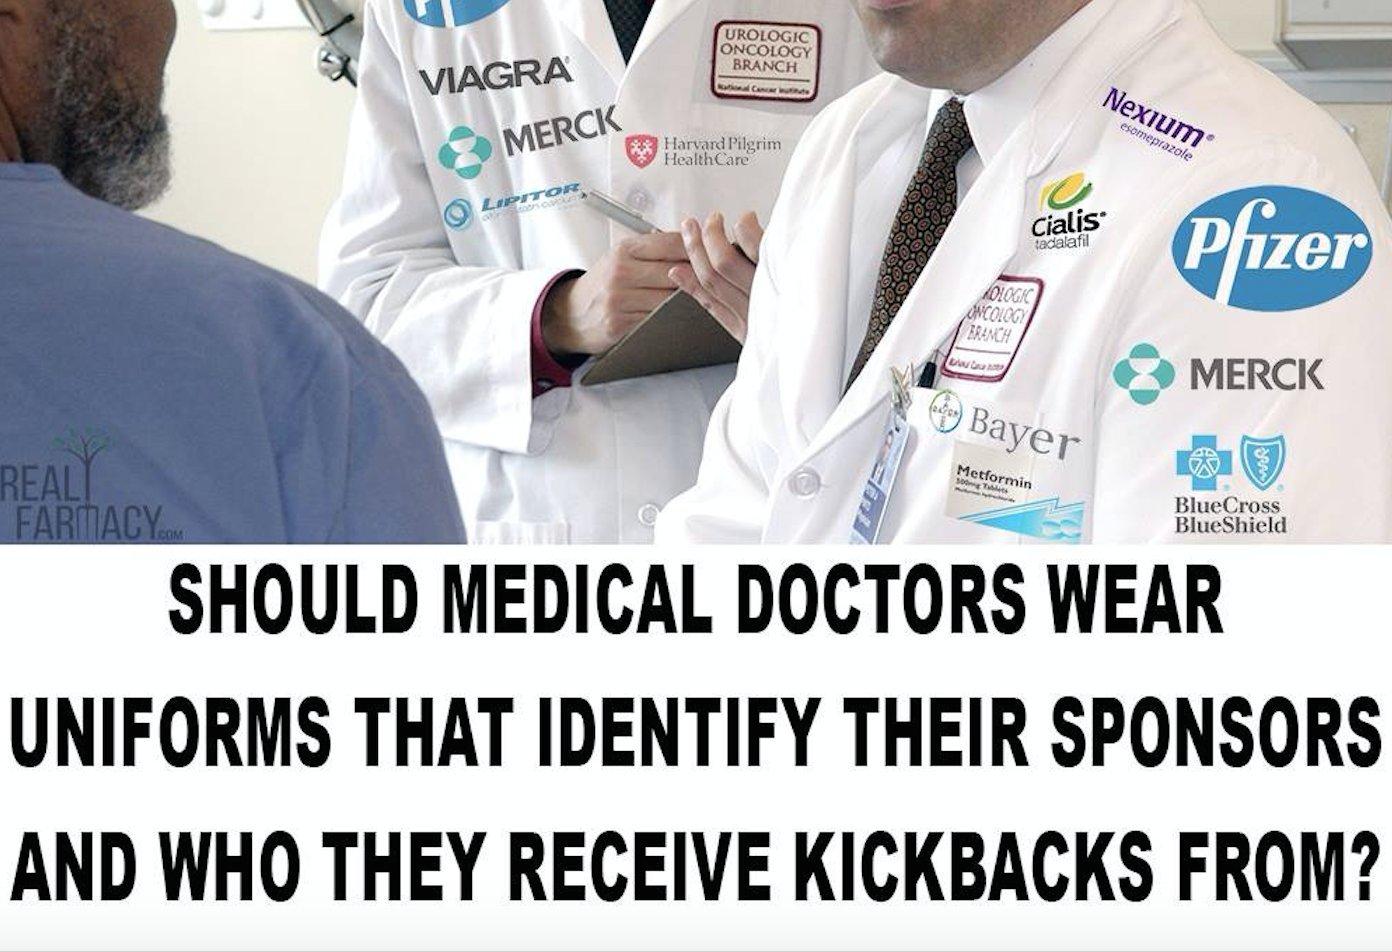 Kickbacks